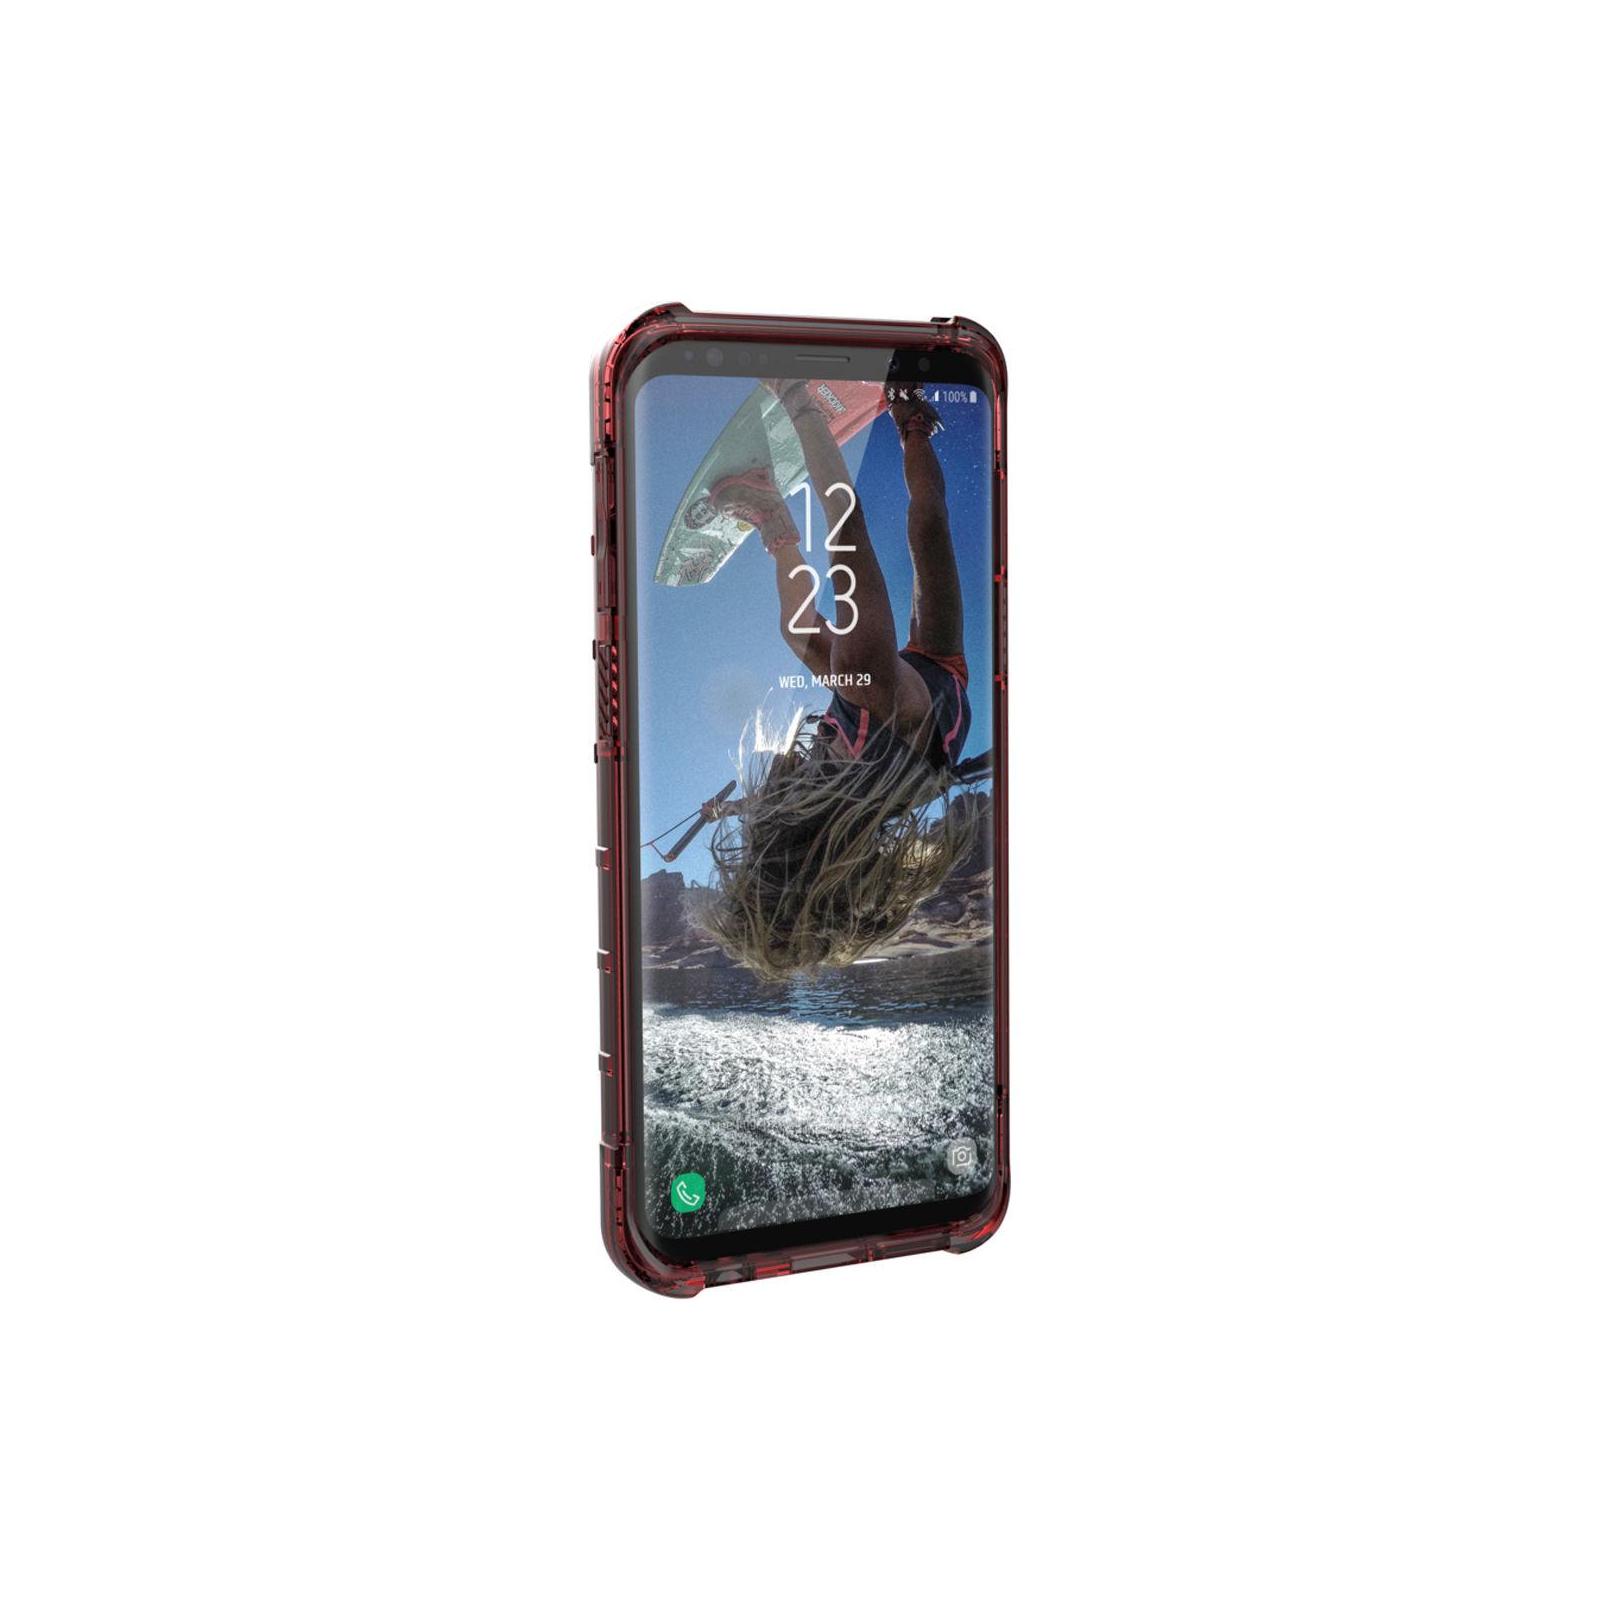 Чехол для моб. телефона Urban Armor Gear Galaxy S9 Plyo Case Crimson (GLXS9-Y-CR) изображение 5